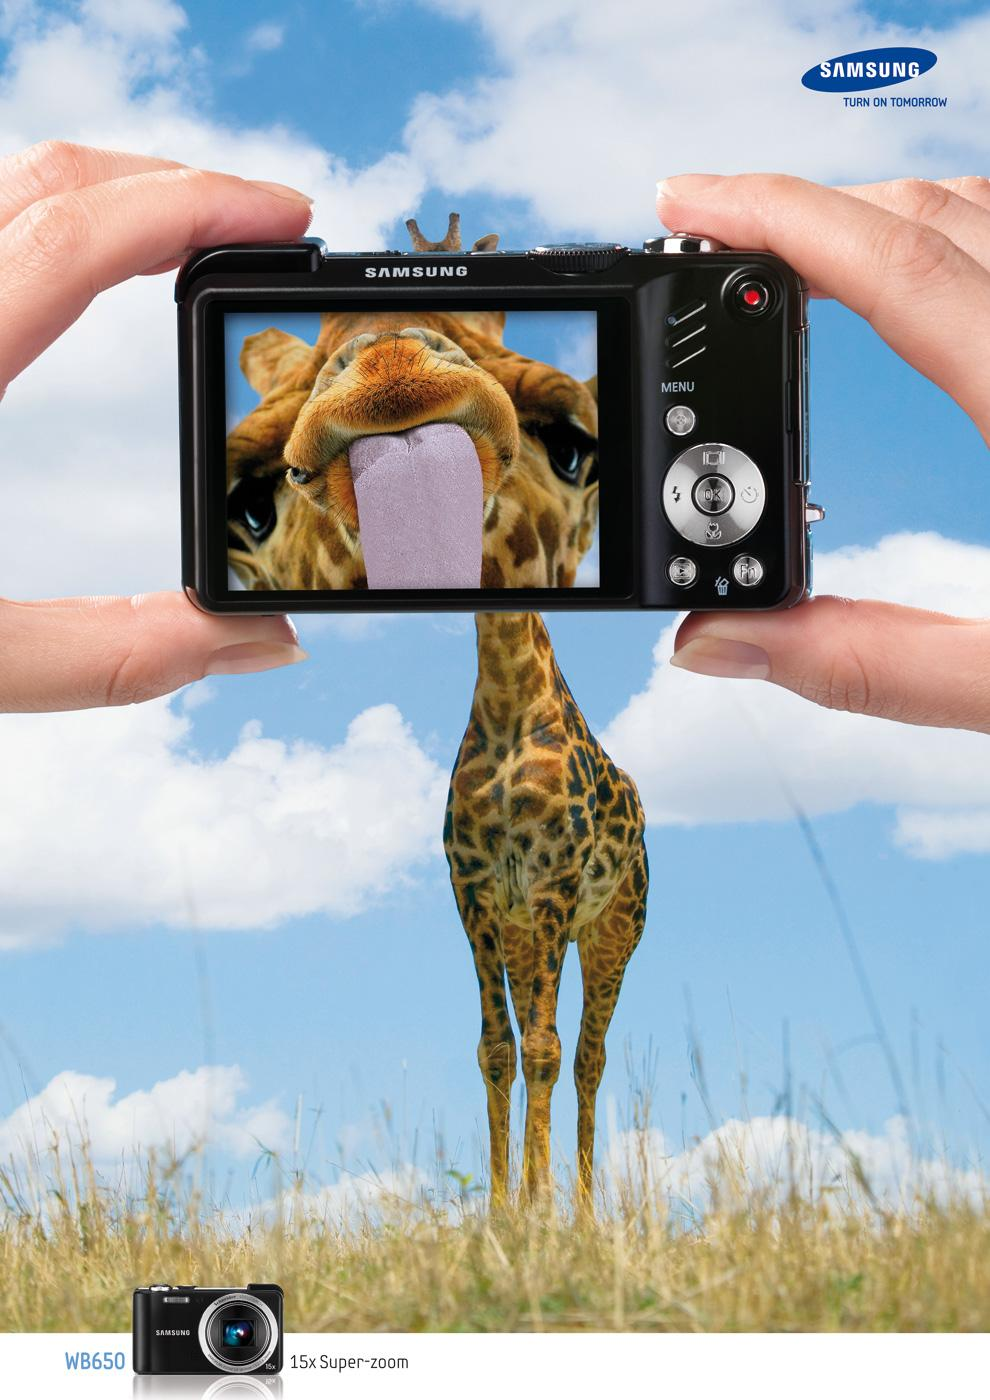 Samsung Print Ad -  15x Super Zoom